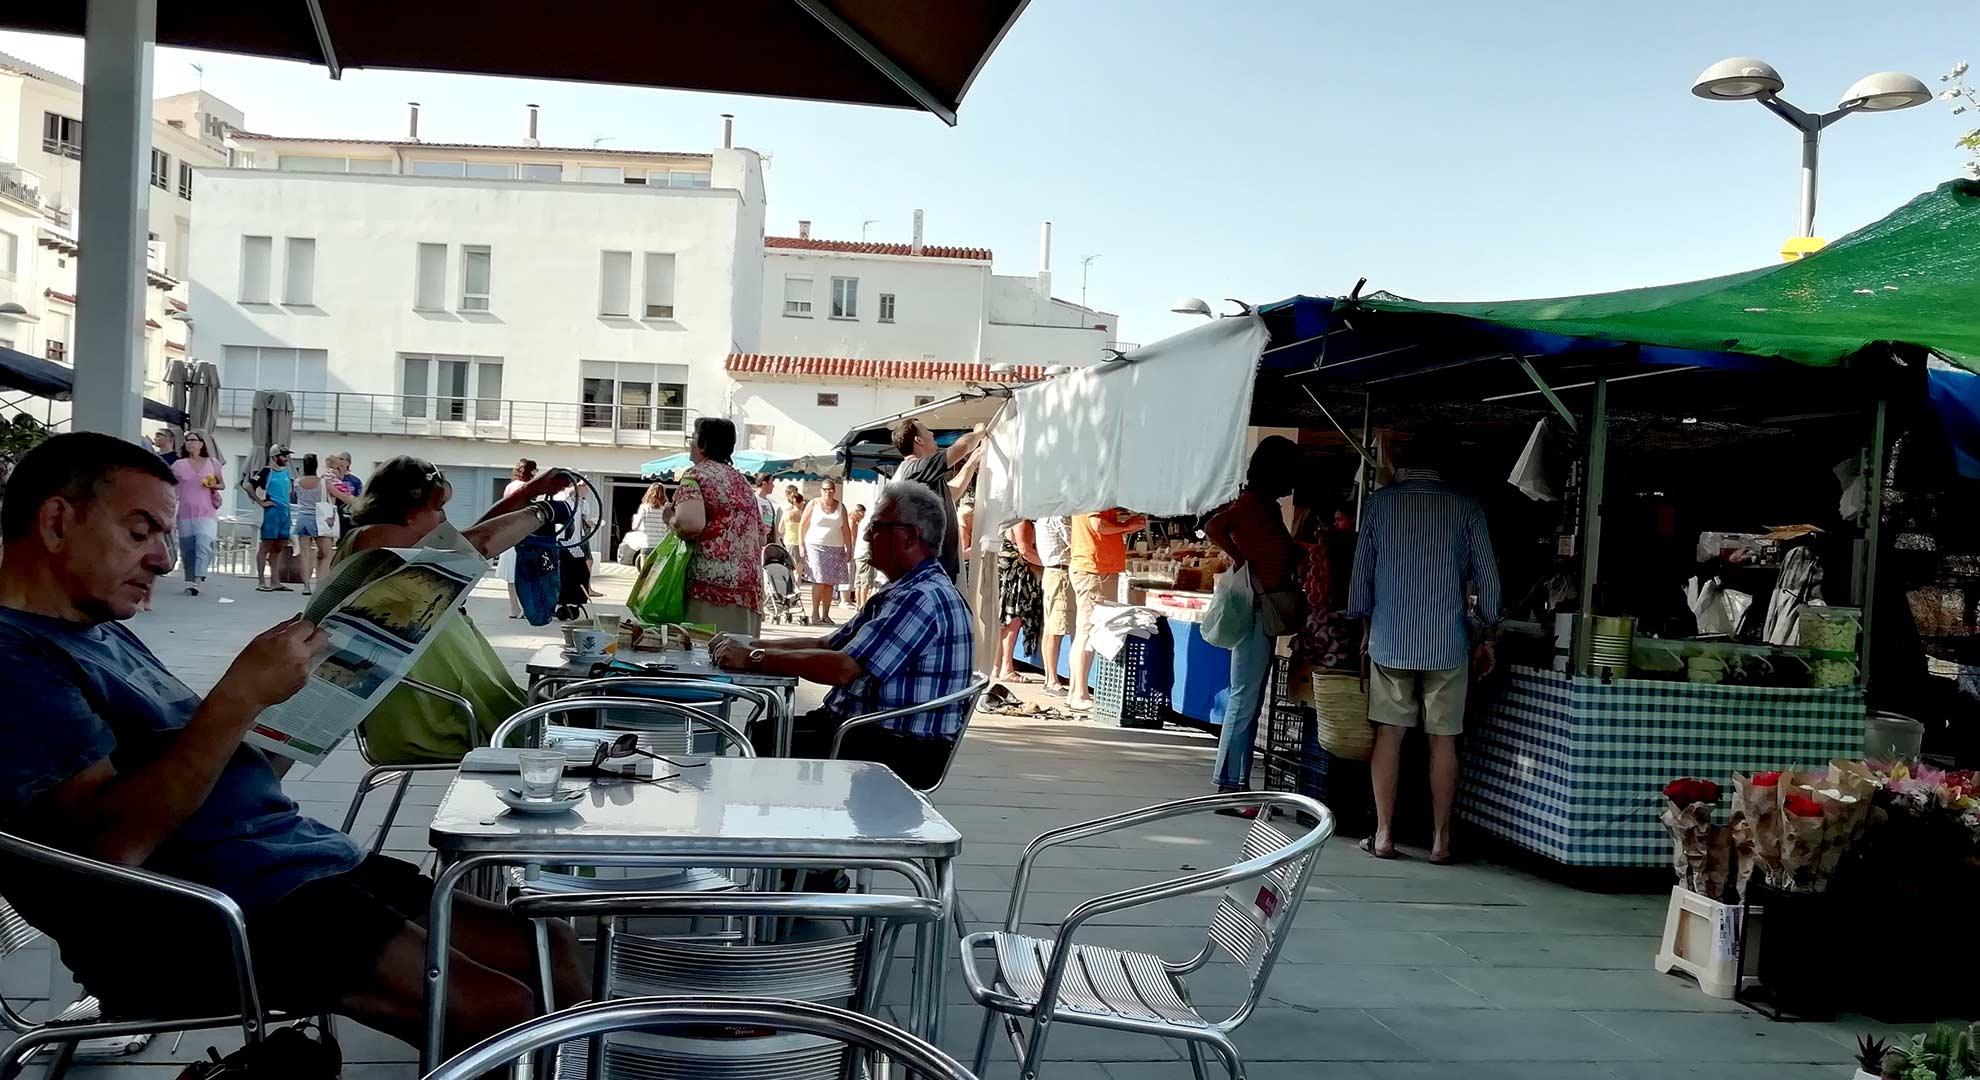 Market day, Port de la Selva, Spain